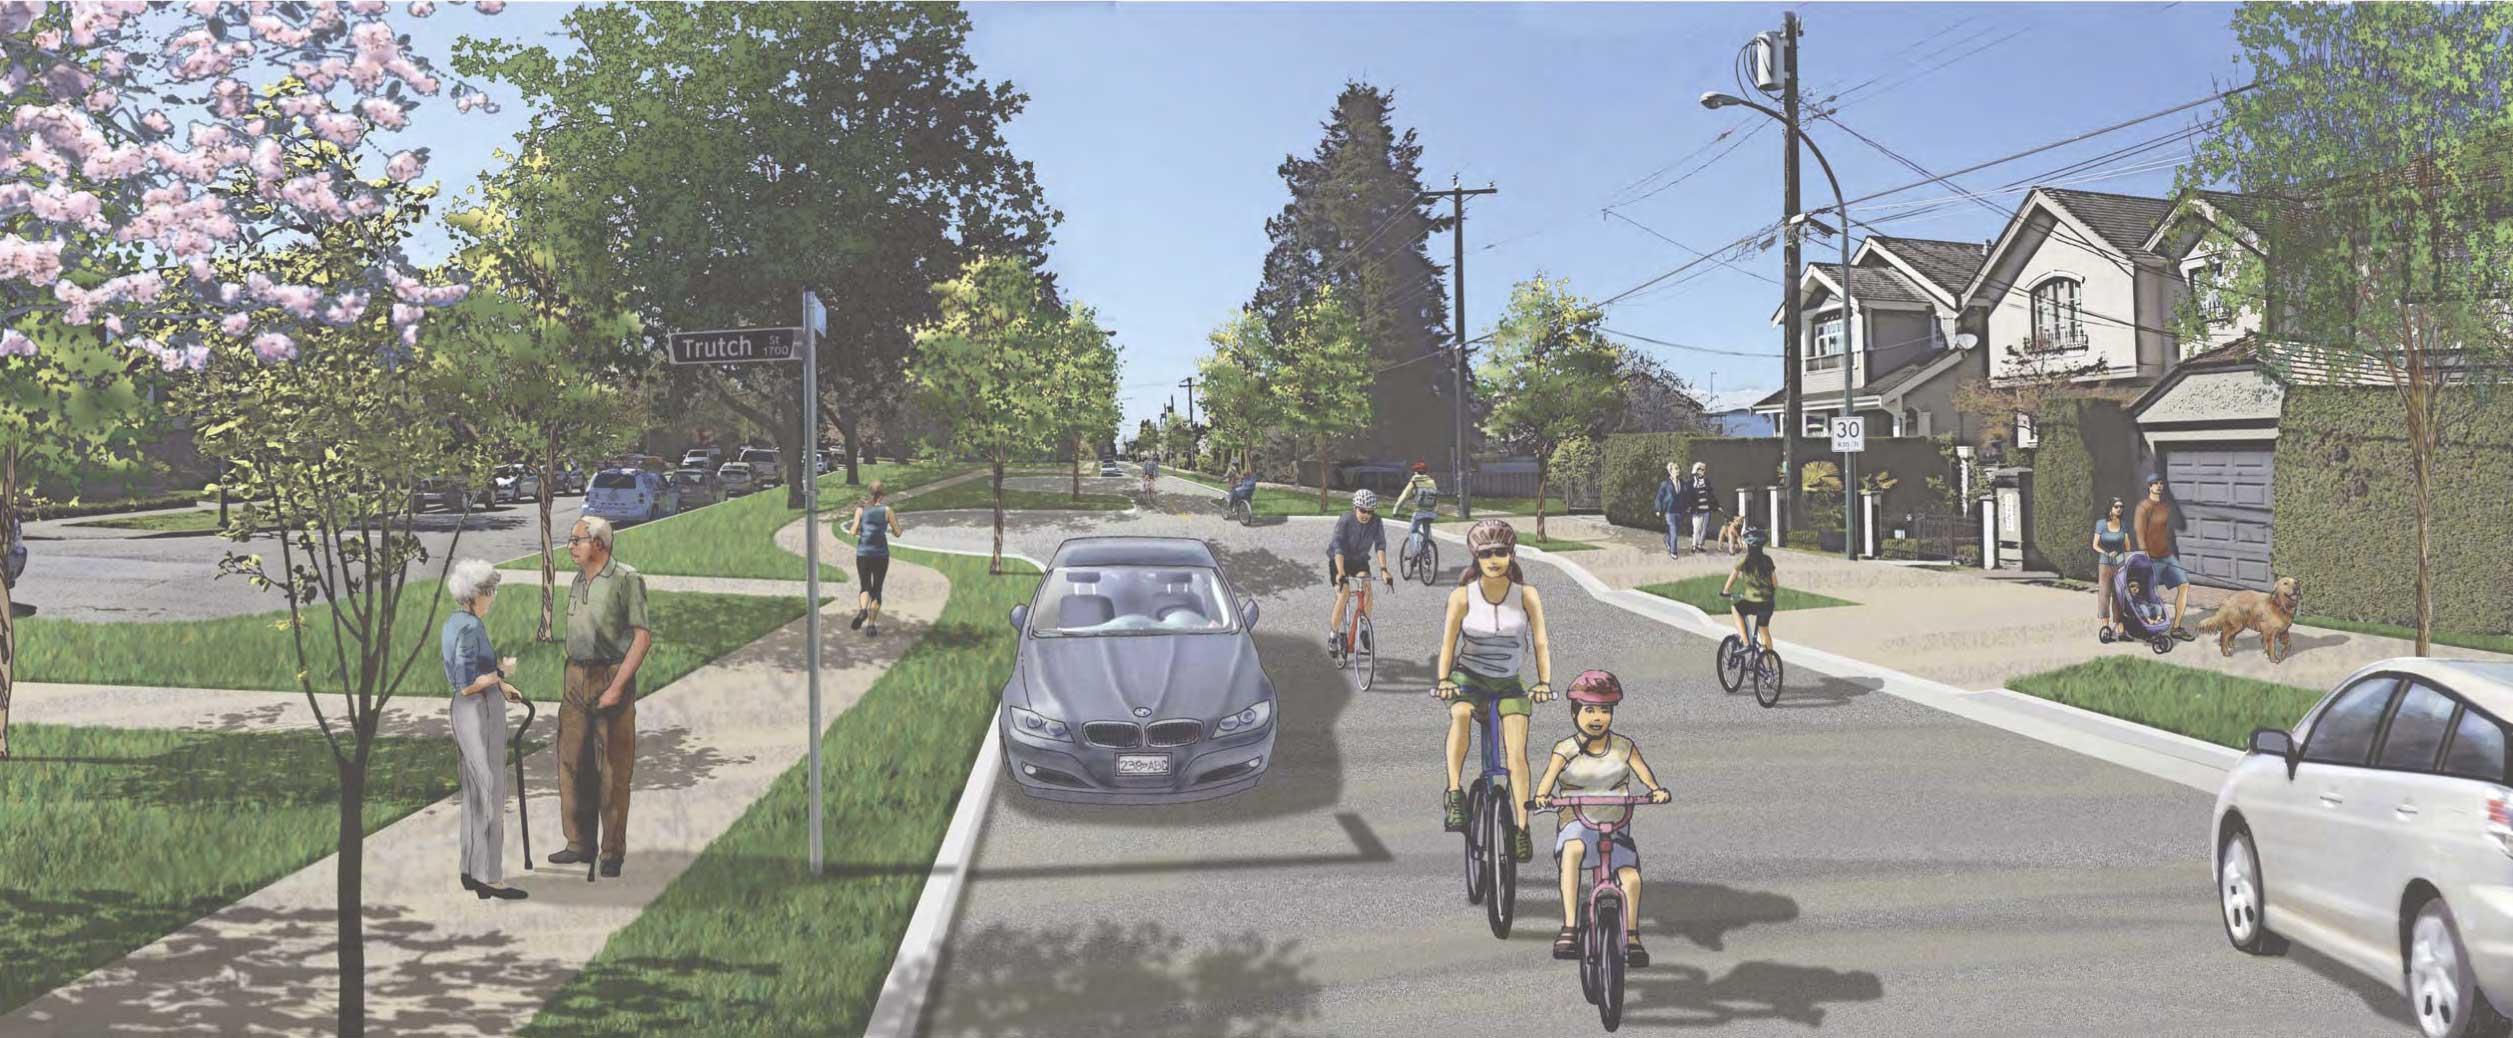 The disturbing bike lane trend in Vancouver